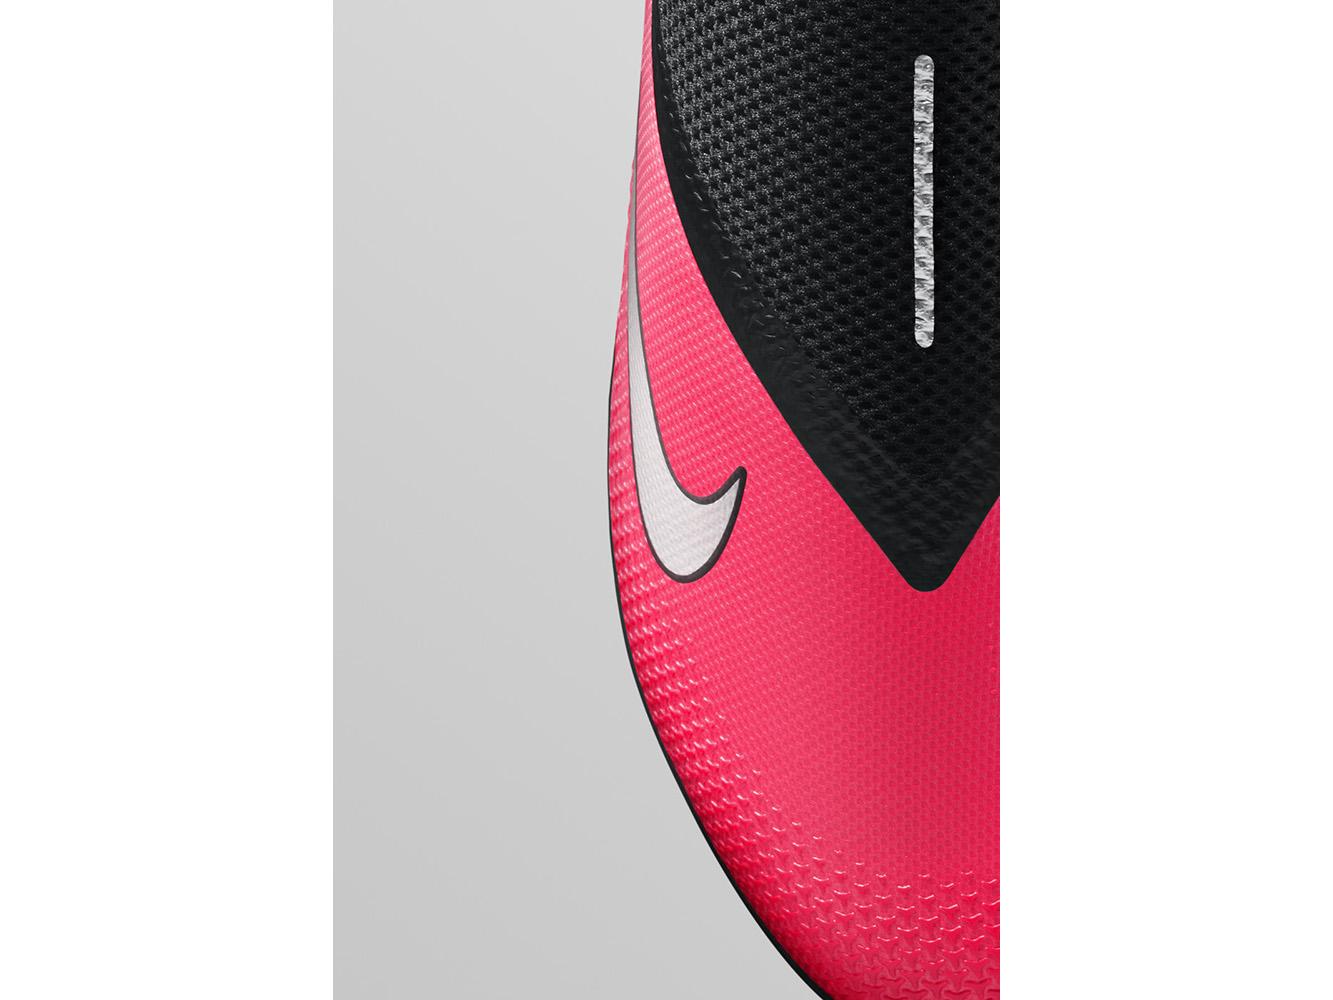 Nike_Football_PhantomVSN2_IC_3_93362